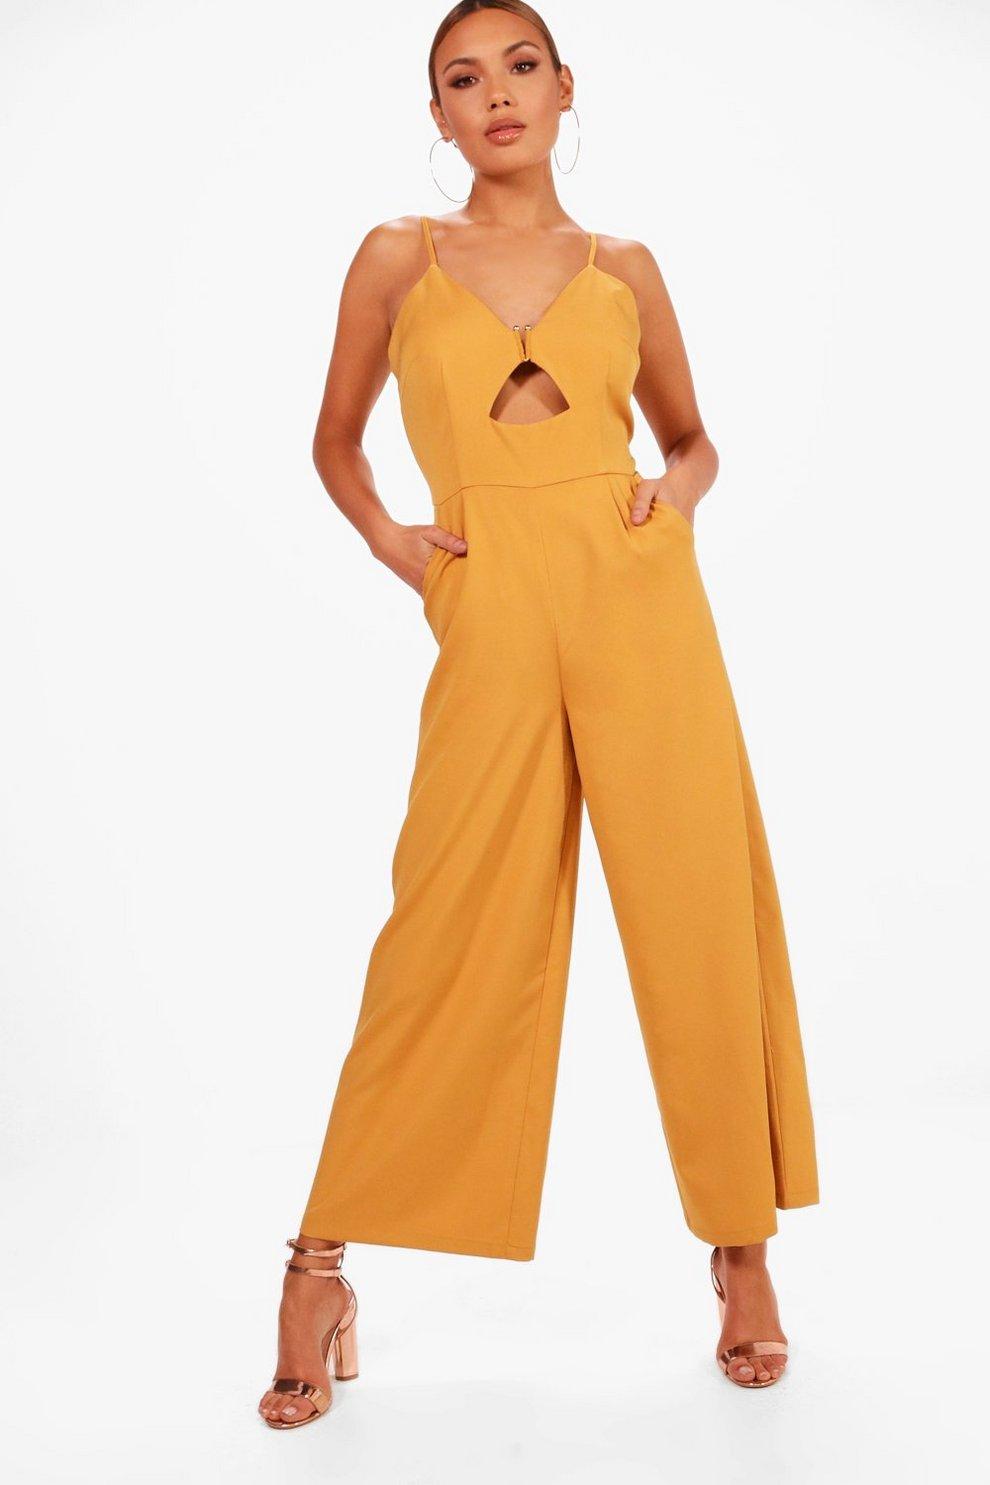 2018 Online Wide Range Of Cheap Online Boohoo Cut Front Culotte Jumpsuit i2Fdf6xk